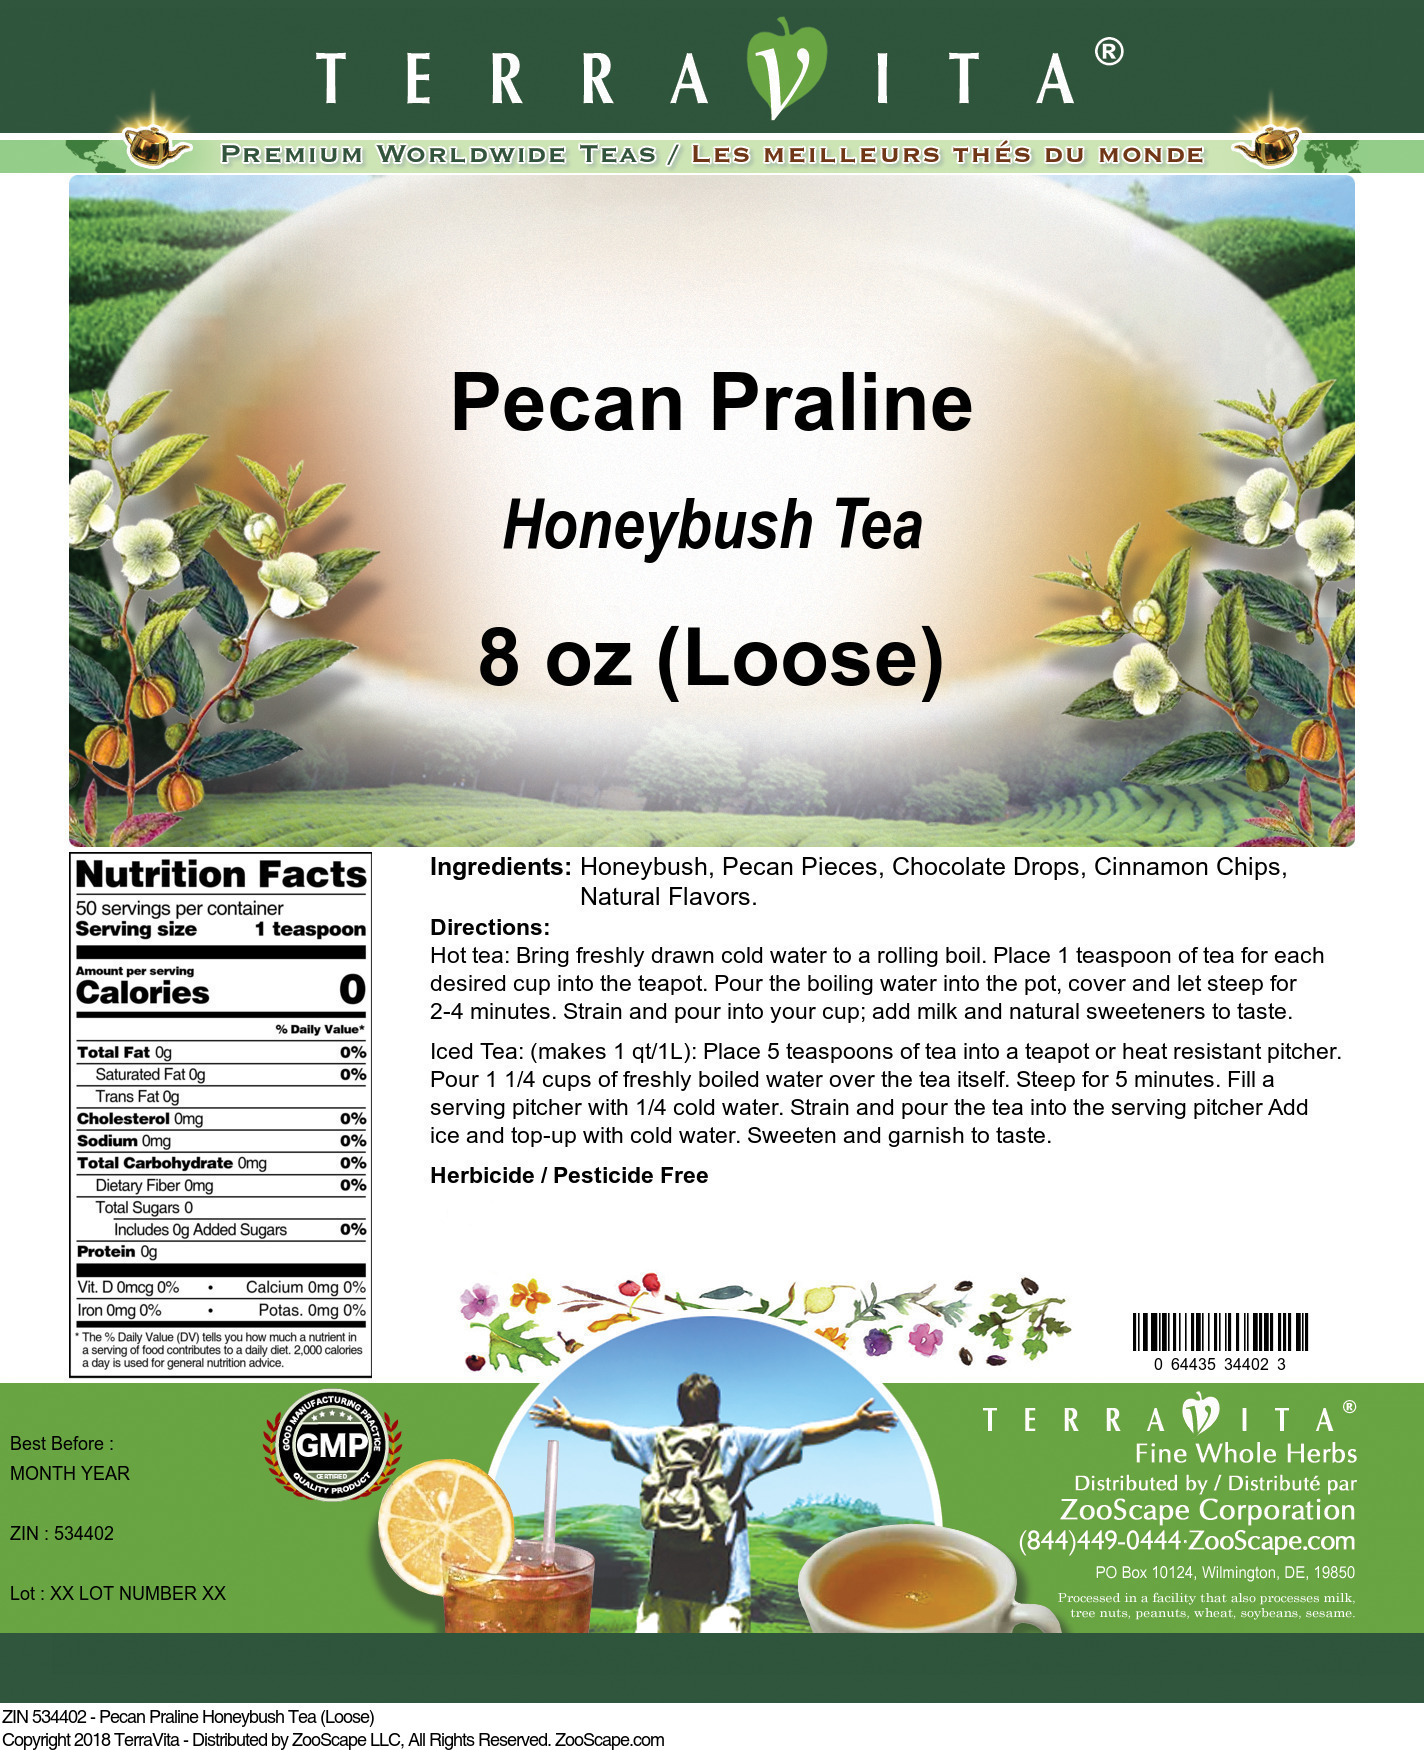 Pecan Praline Honeybush Tea